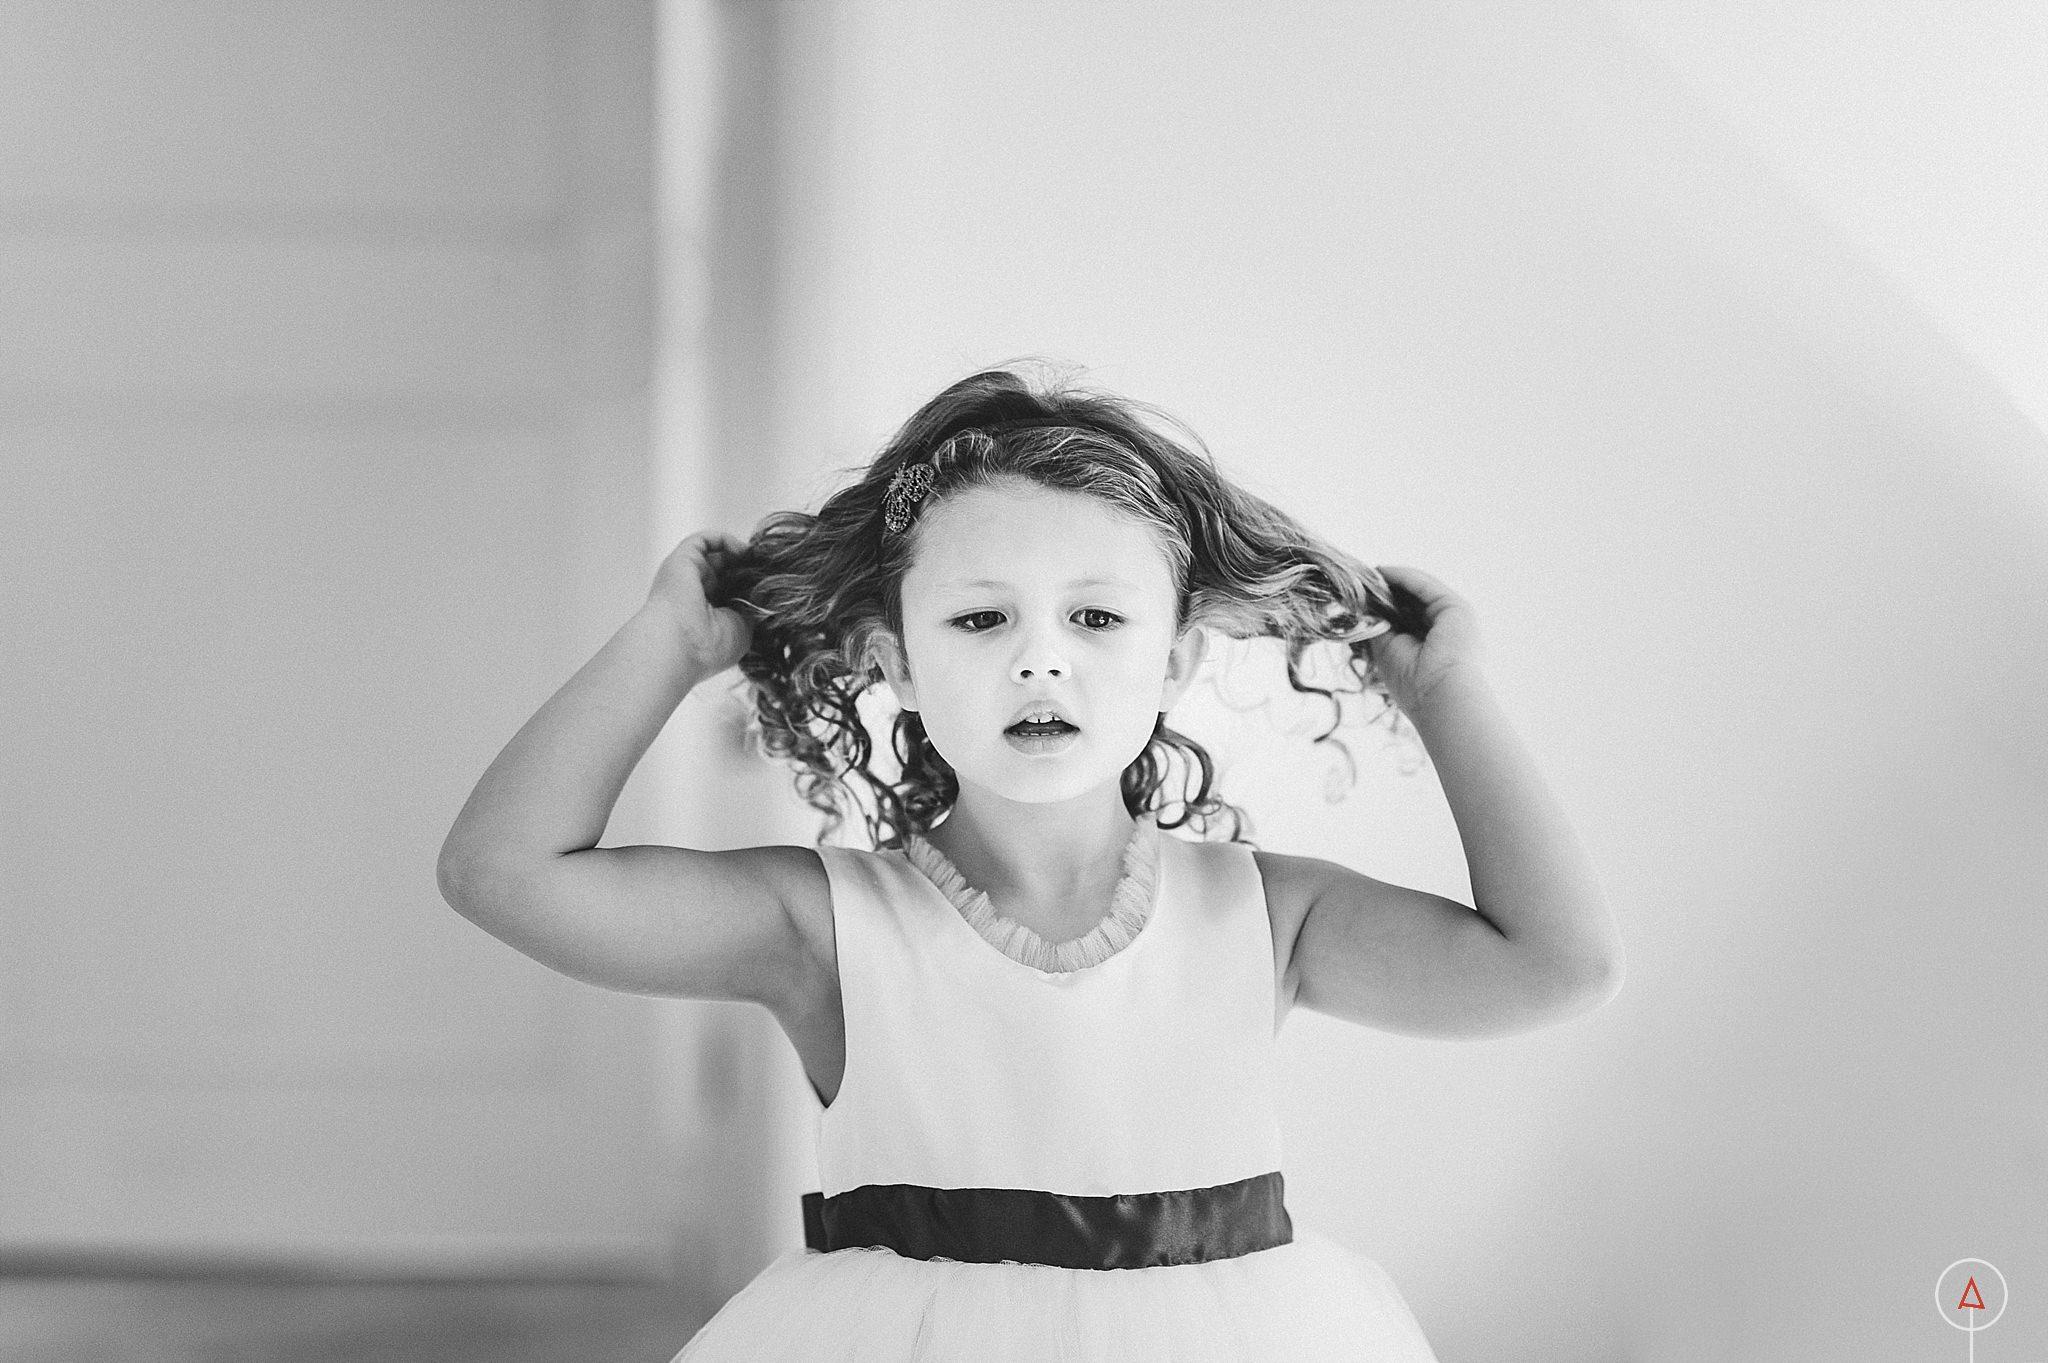 cardiff-wedding-photographer-aga-tomaszek_0343